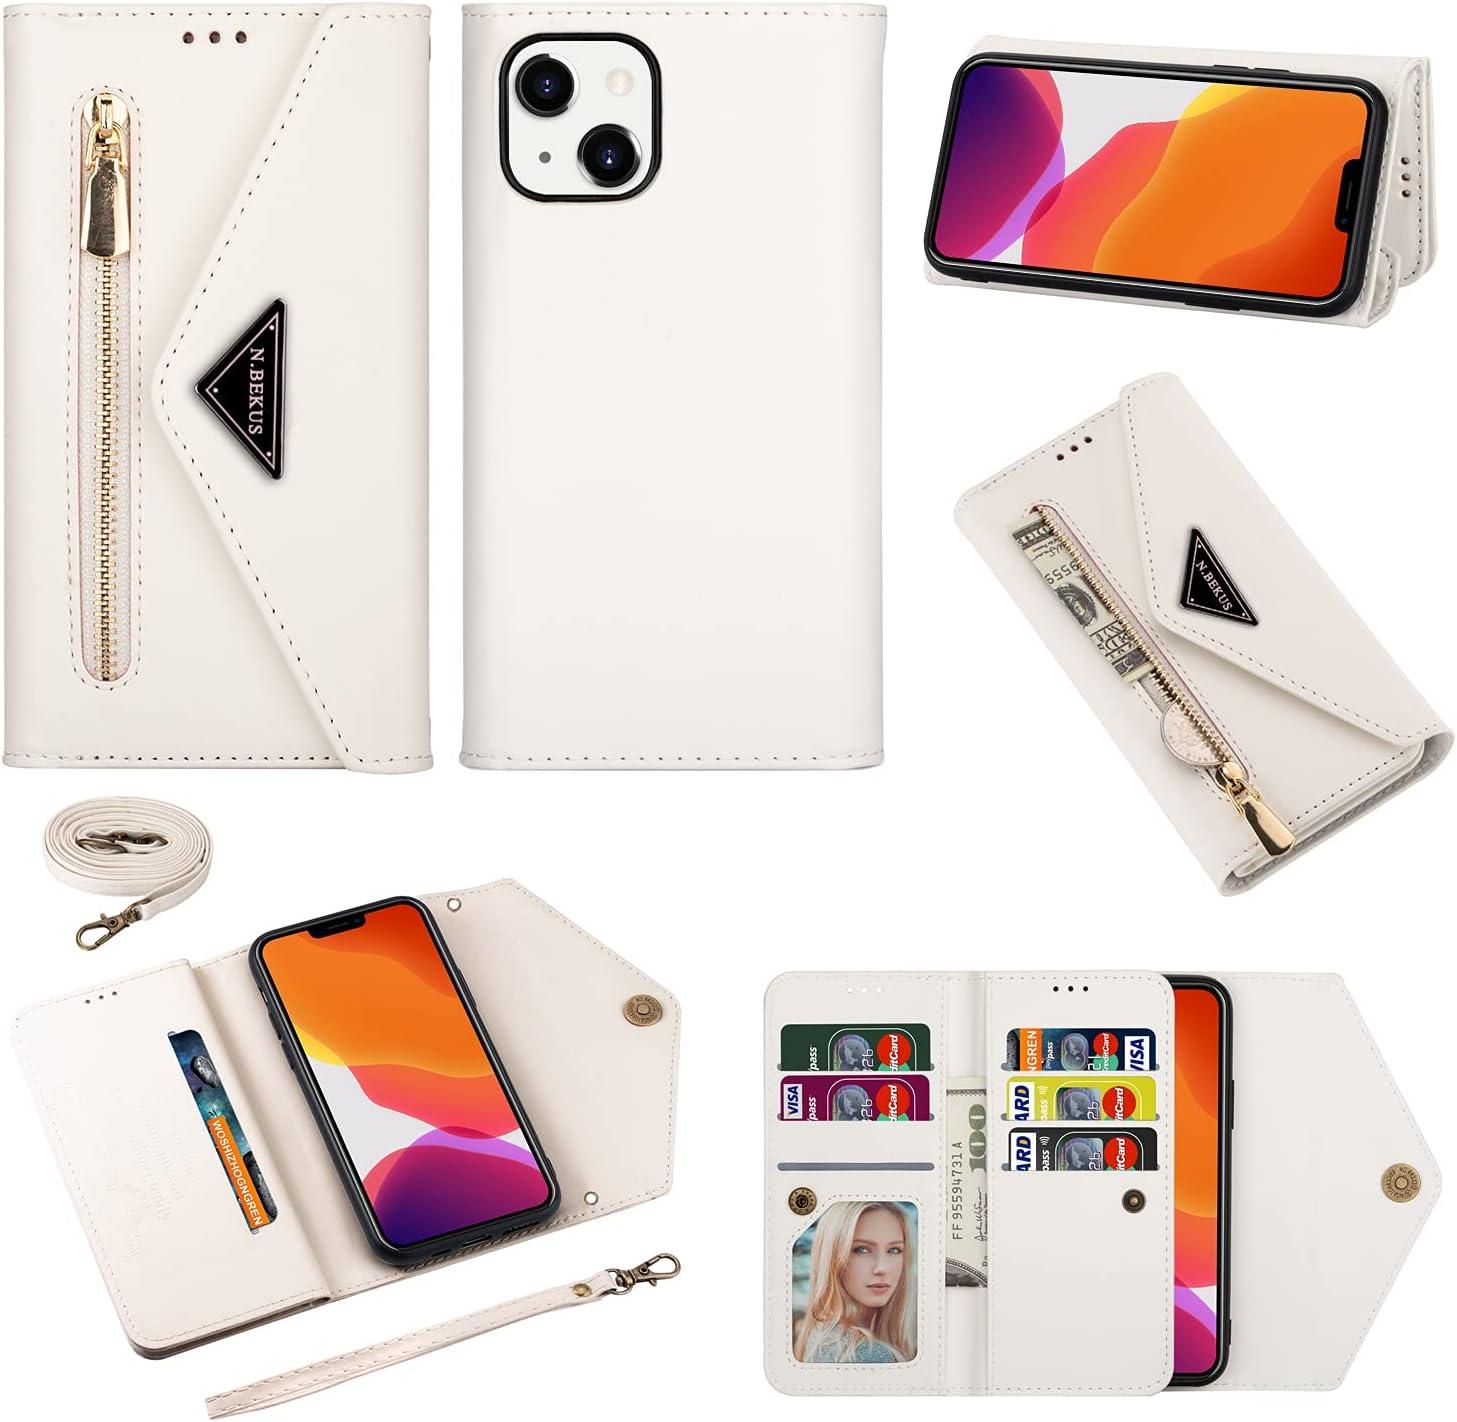 Shoulder Strap Wallet Case for iPhone 13 Mini 5.4 inch Zipper Folio Flip Case, Lanyard Bumper Cover Cross-Body Shell (White)